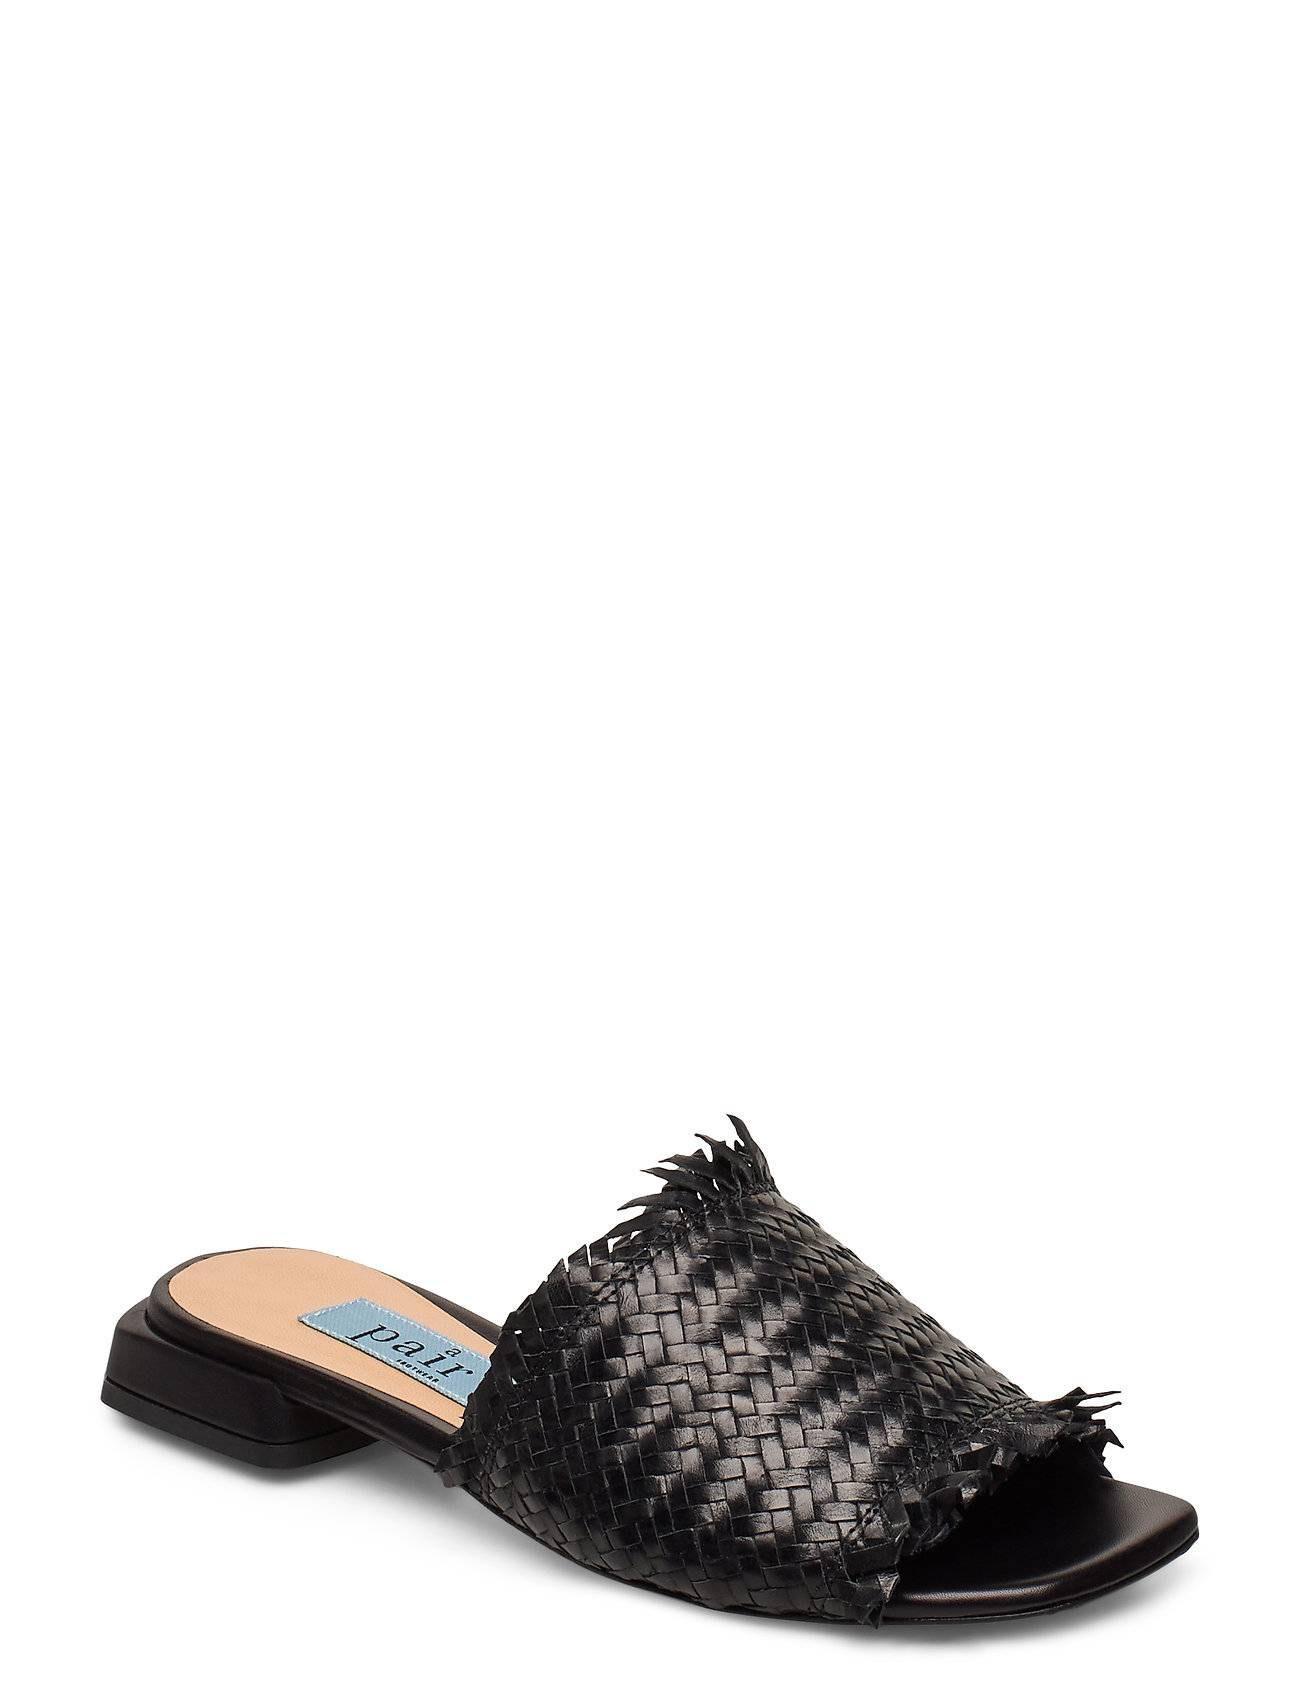 Apair Braided Flat Sandal Shoes Summer Shoes Flat Sandals Musta Apair